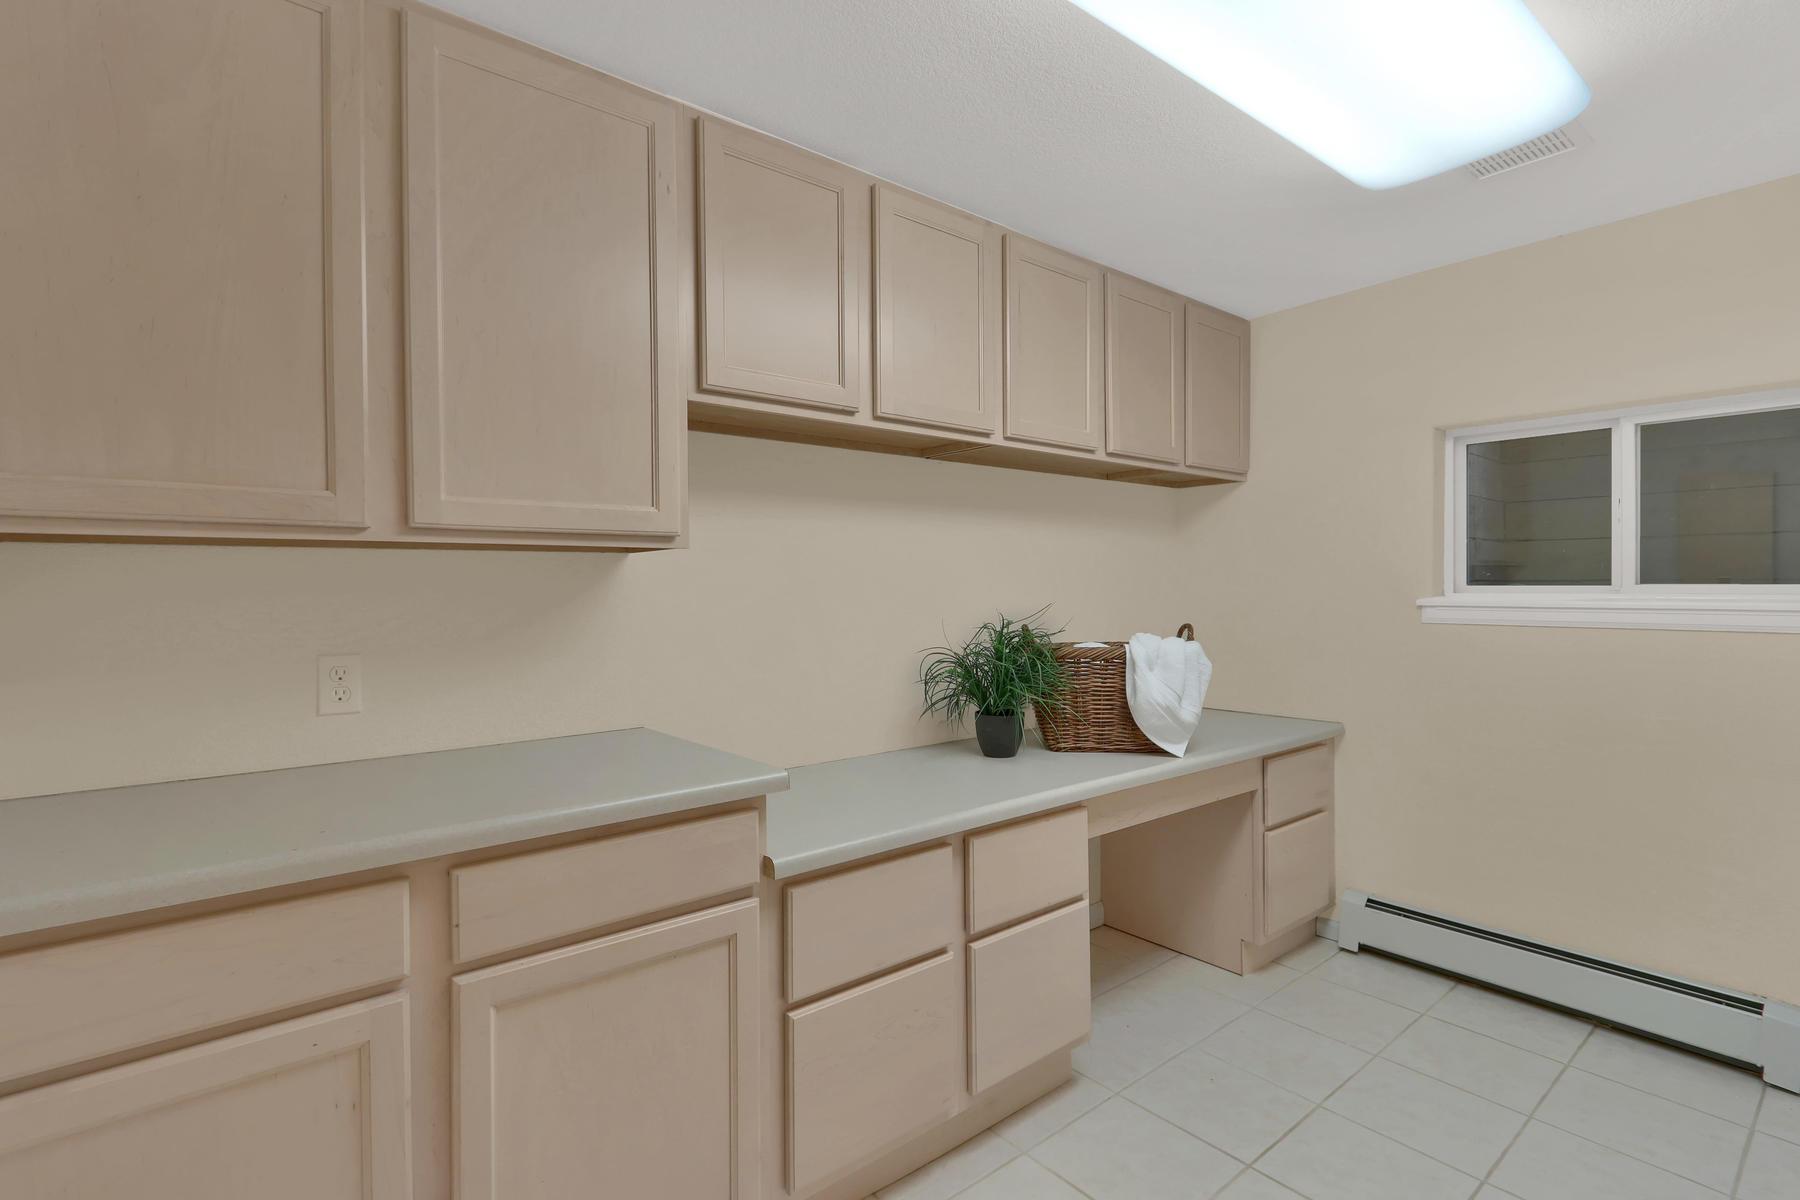 3845 Everett St Wheat Ridge CO-038-11-Laundry-MLS_Size.jpg